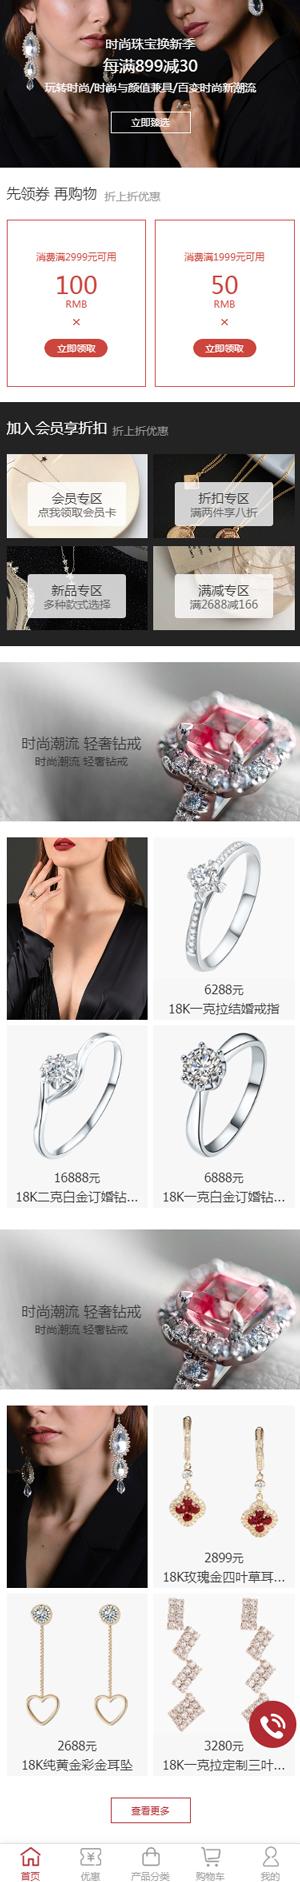 Jewelry珠宝小程序商城模板